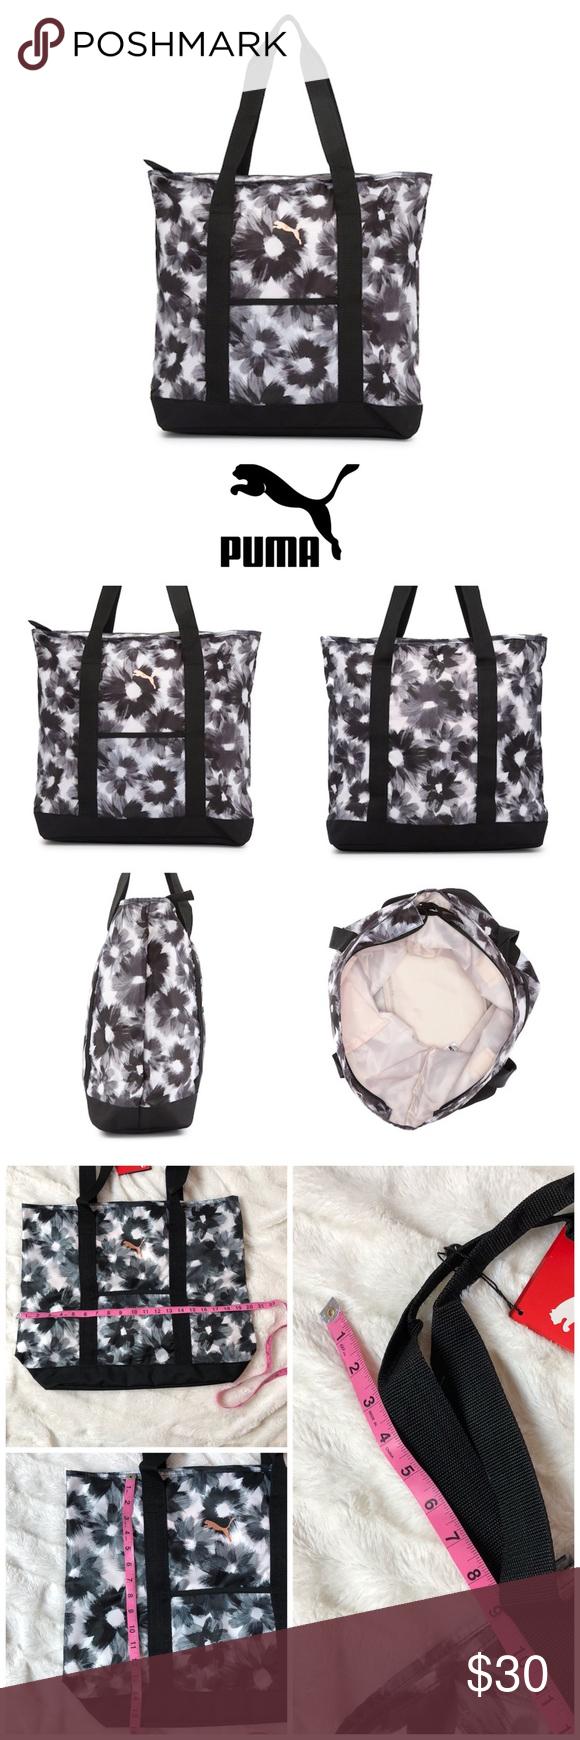 a0f7e2b80ac5 PUMA Evercat Cambridge Tote PUMA Tote Bag in stylish yet sporty floral  brush stroke print.